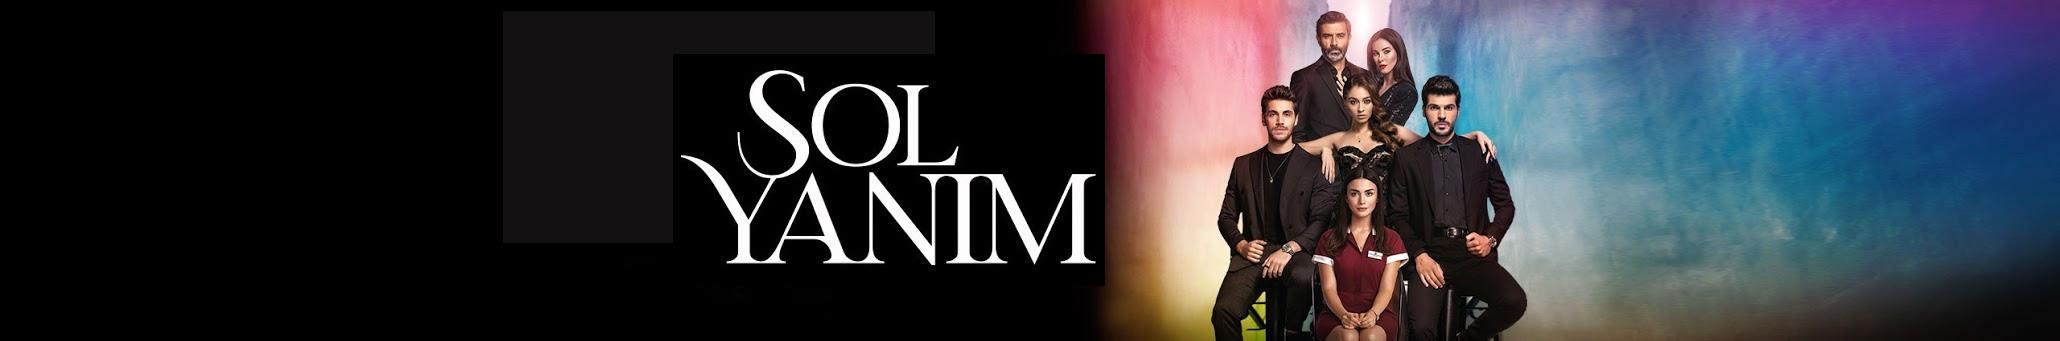 Sol Yanim English subtitles | My Left Side